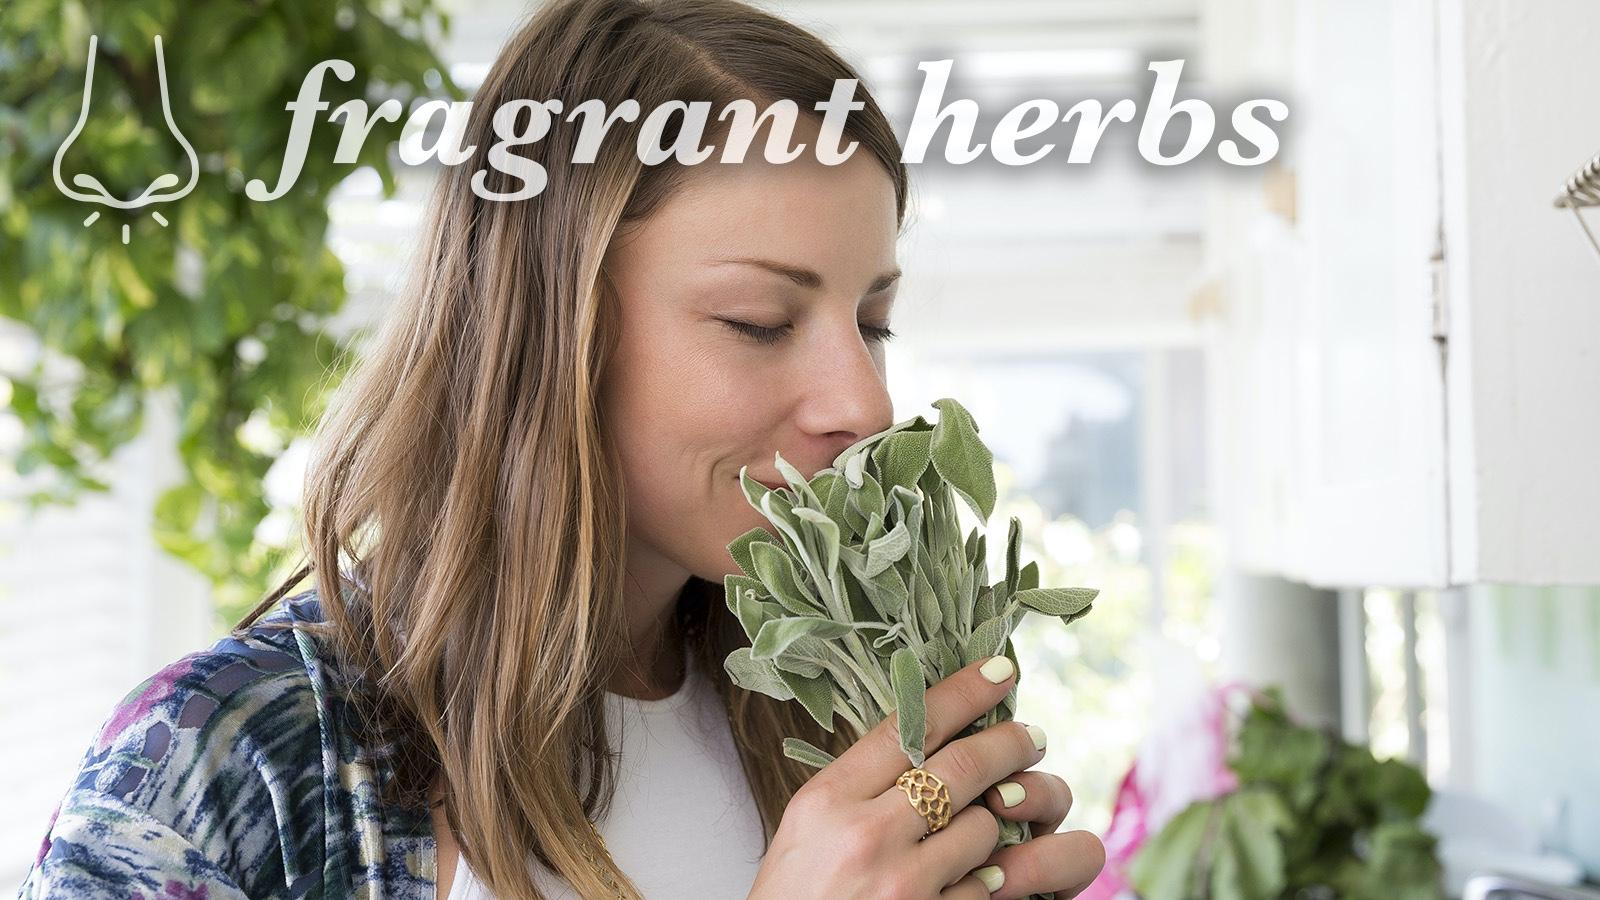 scent sensory word fragrant herbs description